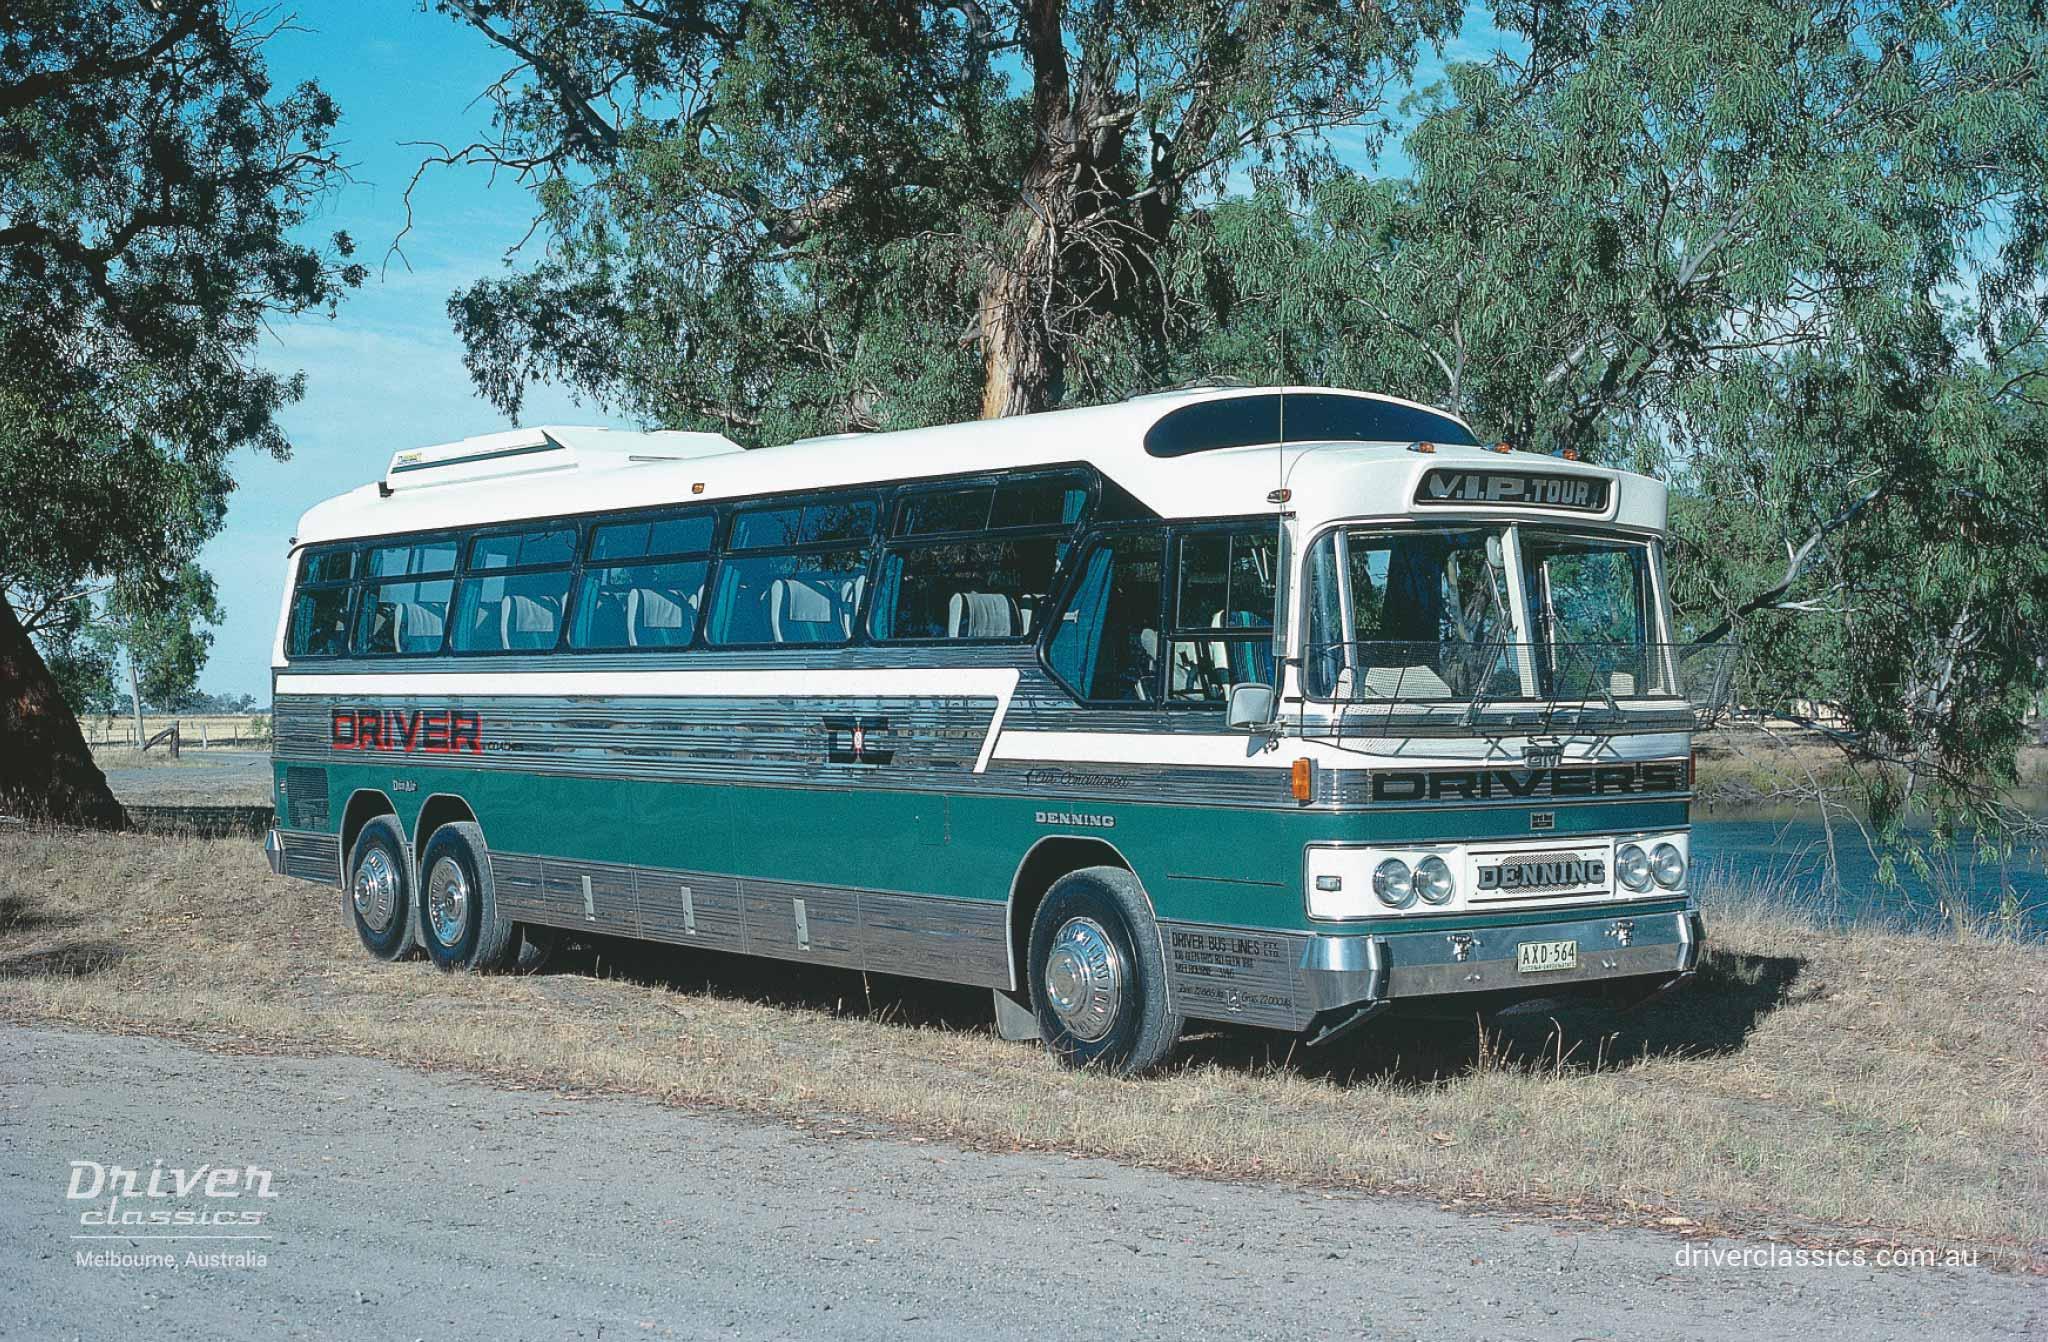 GM Denning Denair bus (1980 version), Katamatite, Victoria, 1981